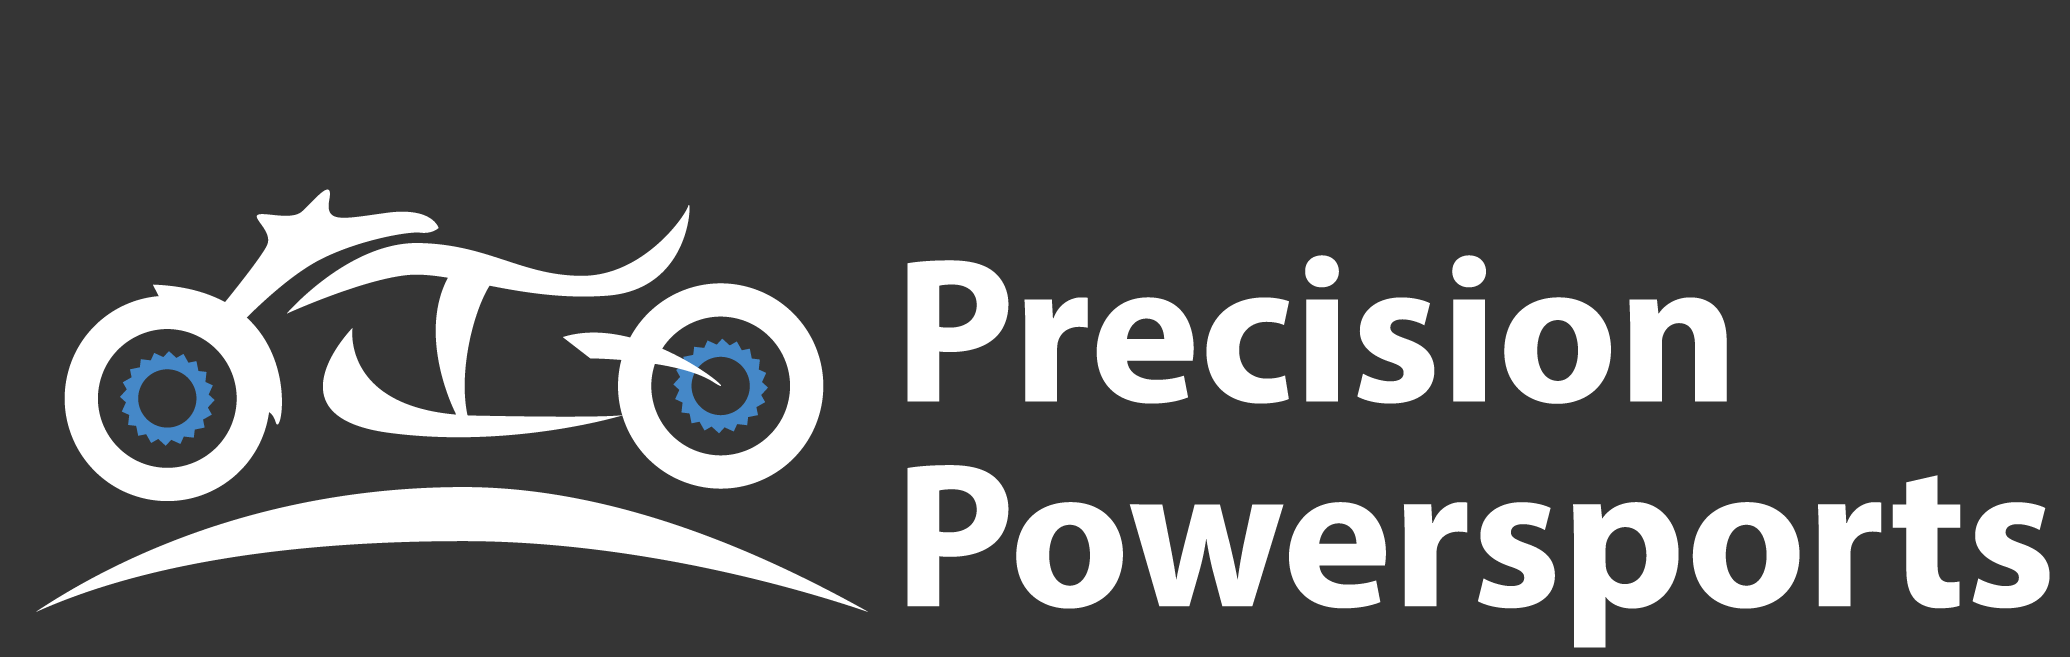 Precision Powersports